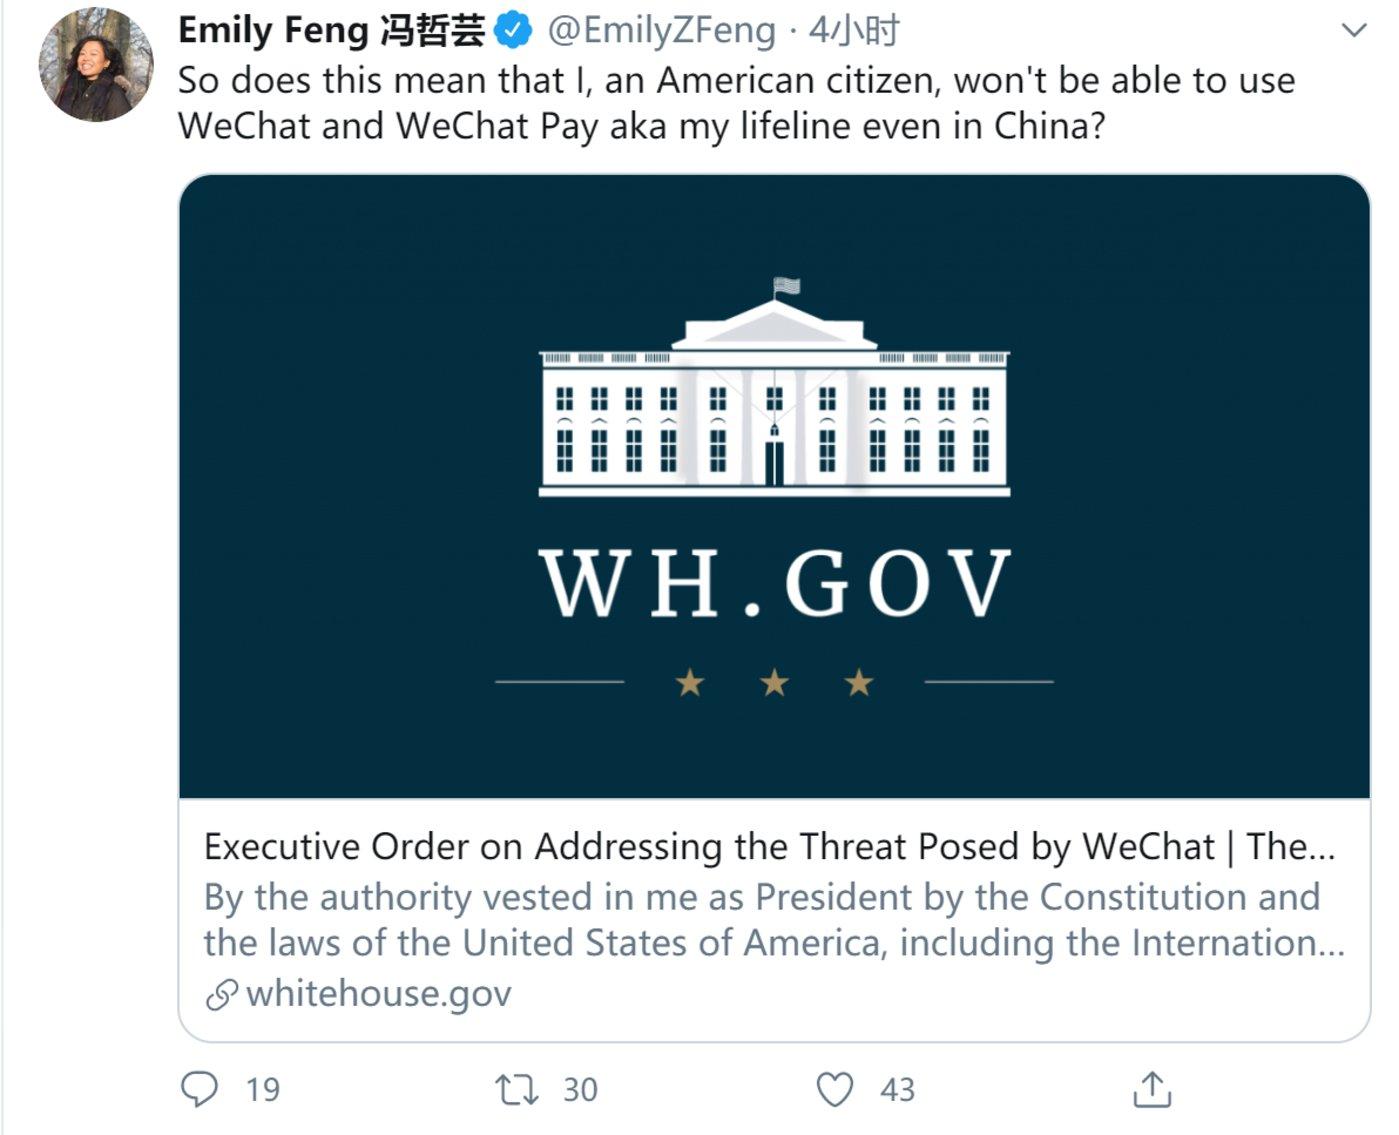 NPR记者冯哲芸质问:是否行政命令意味着,作为美国公民的她,甚至无法在中国境内使用微信和微信支付?/Twitter